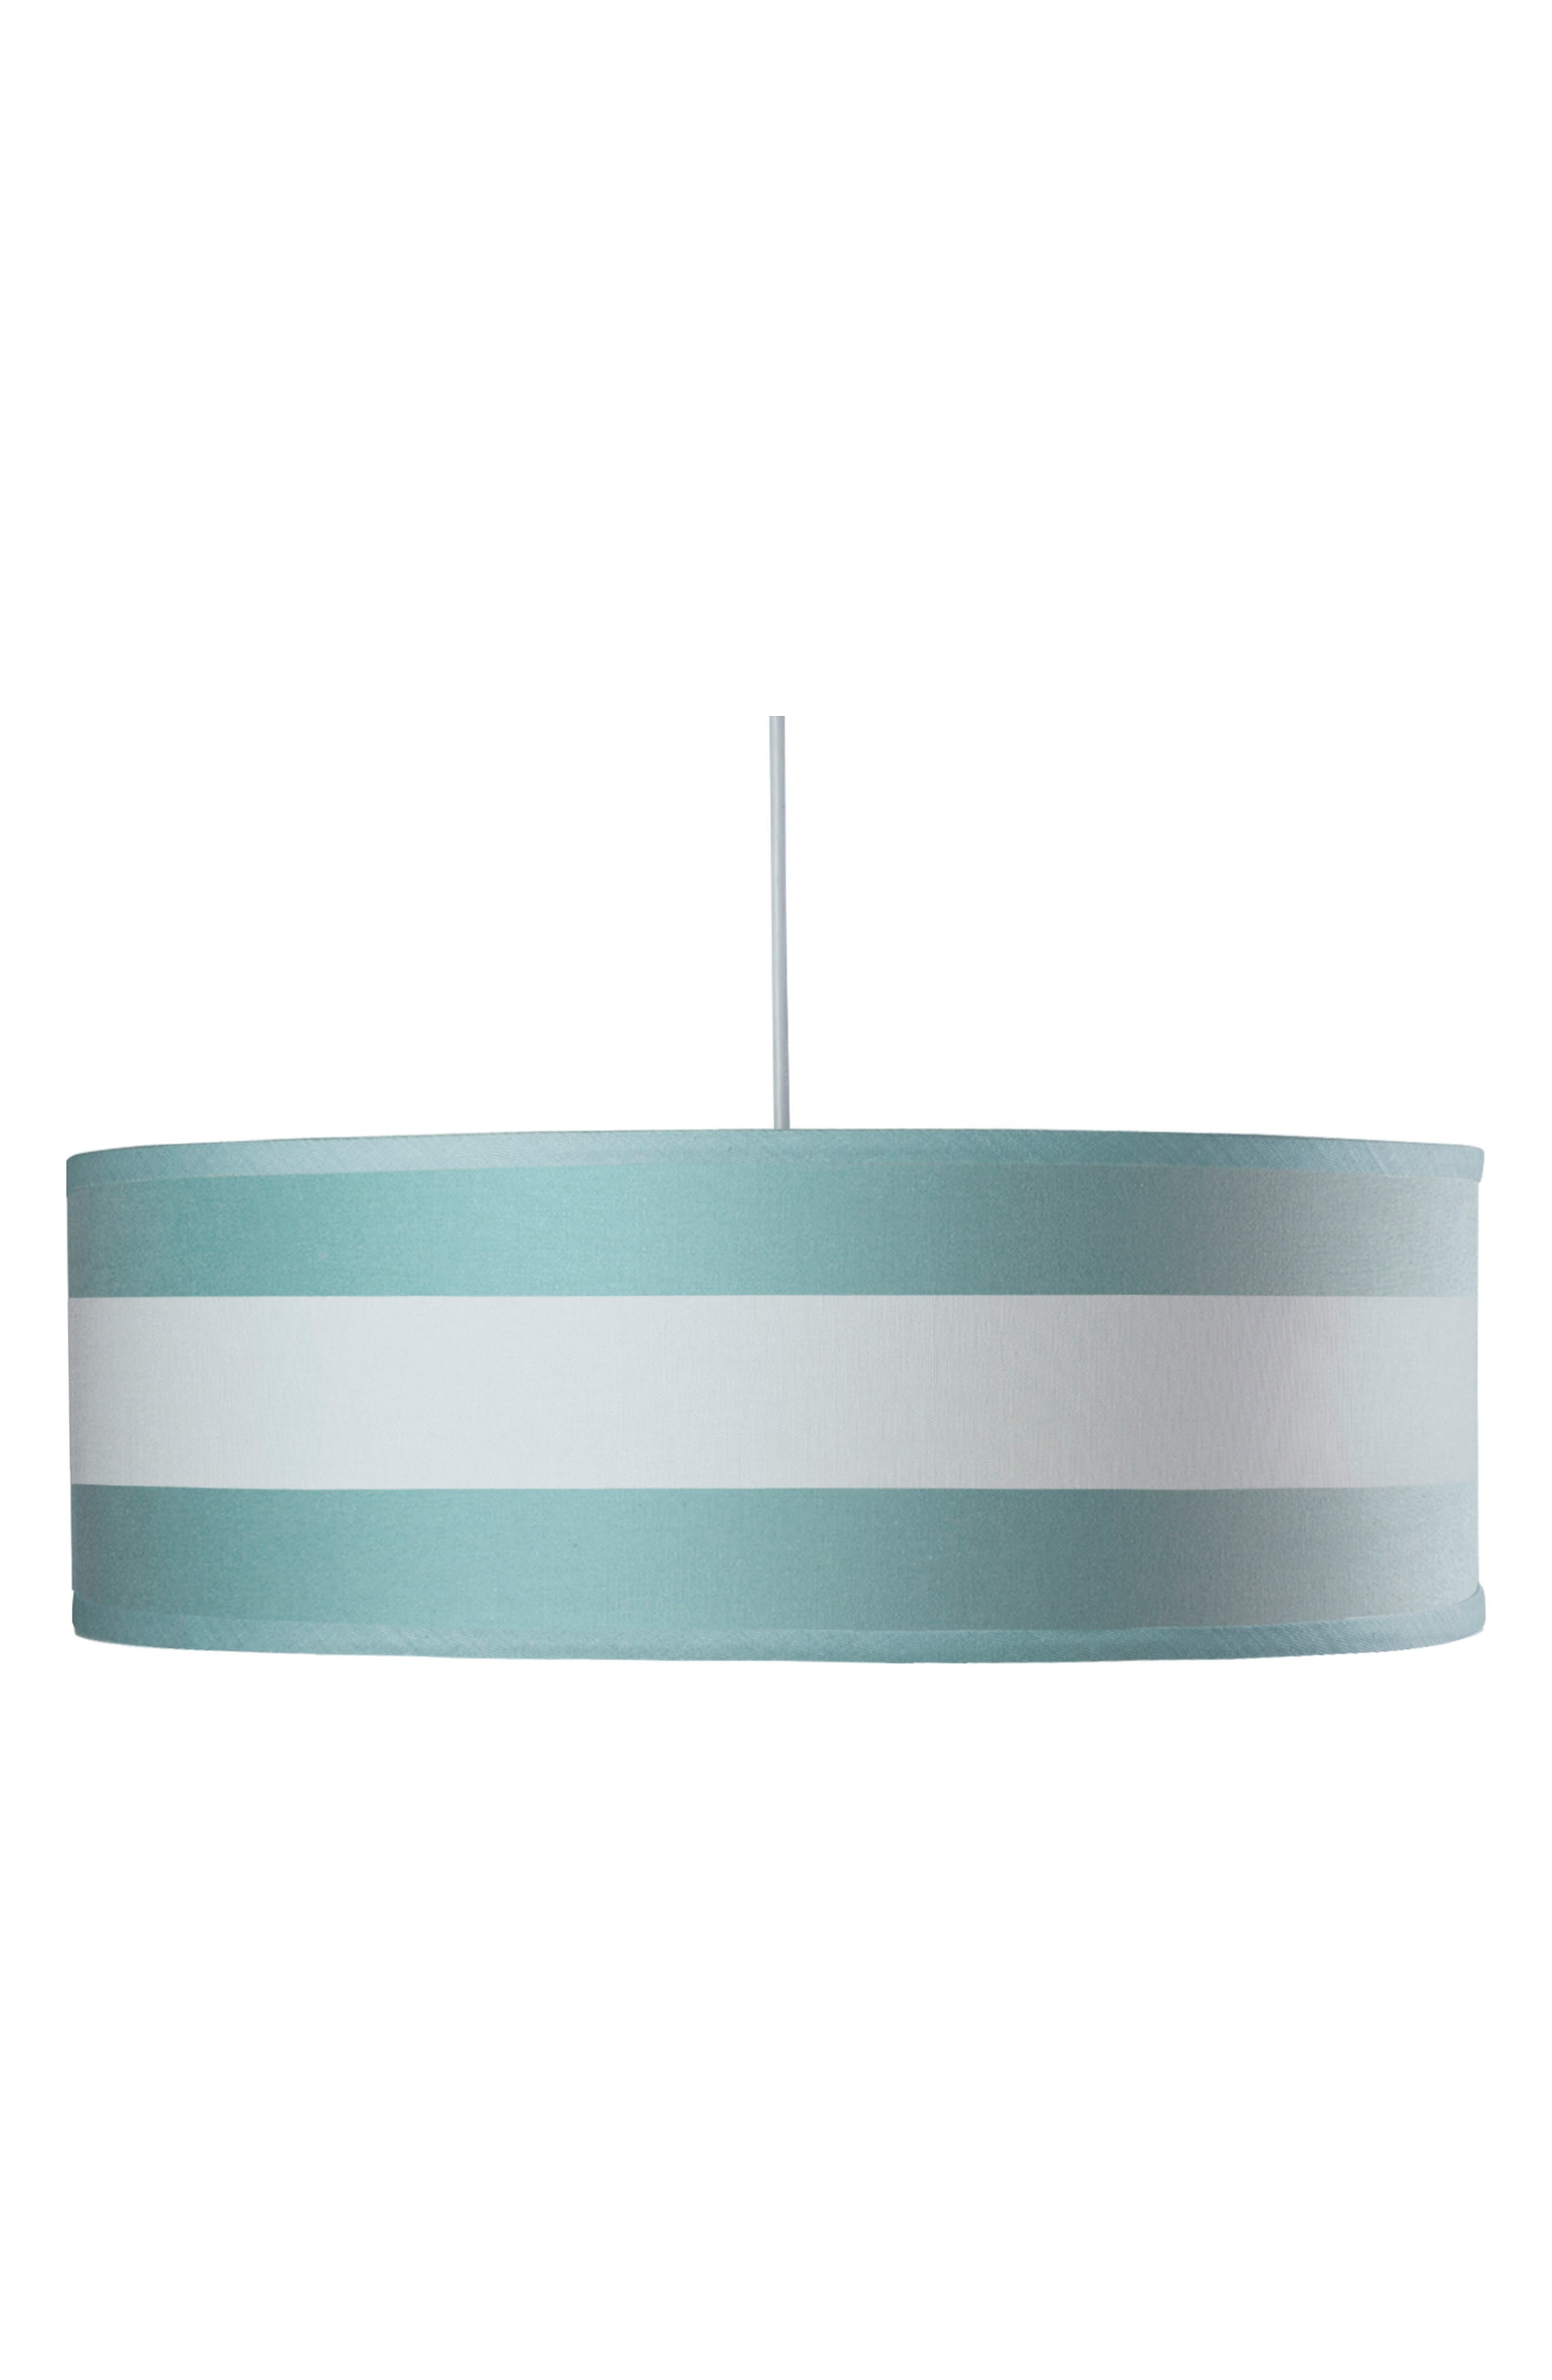 Main Image - Oilo Shallow Cylinder Light